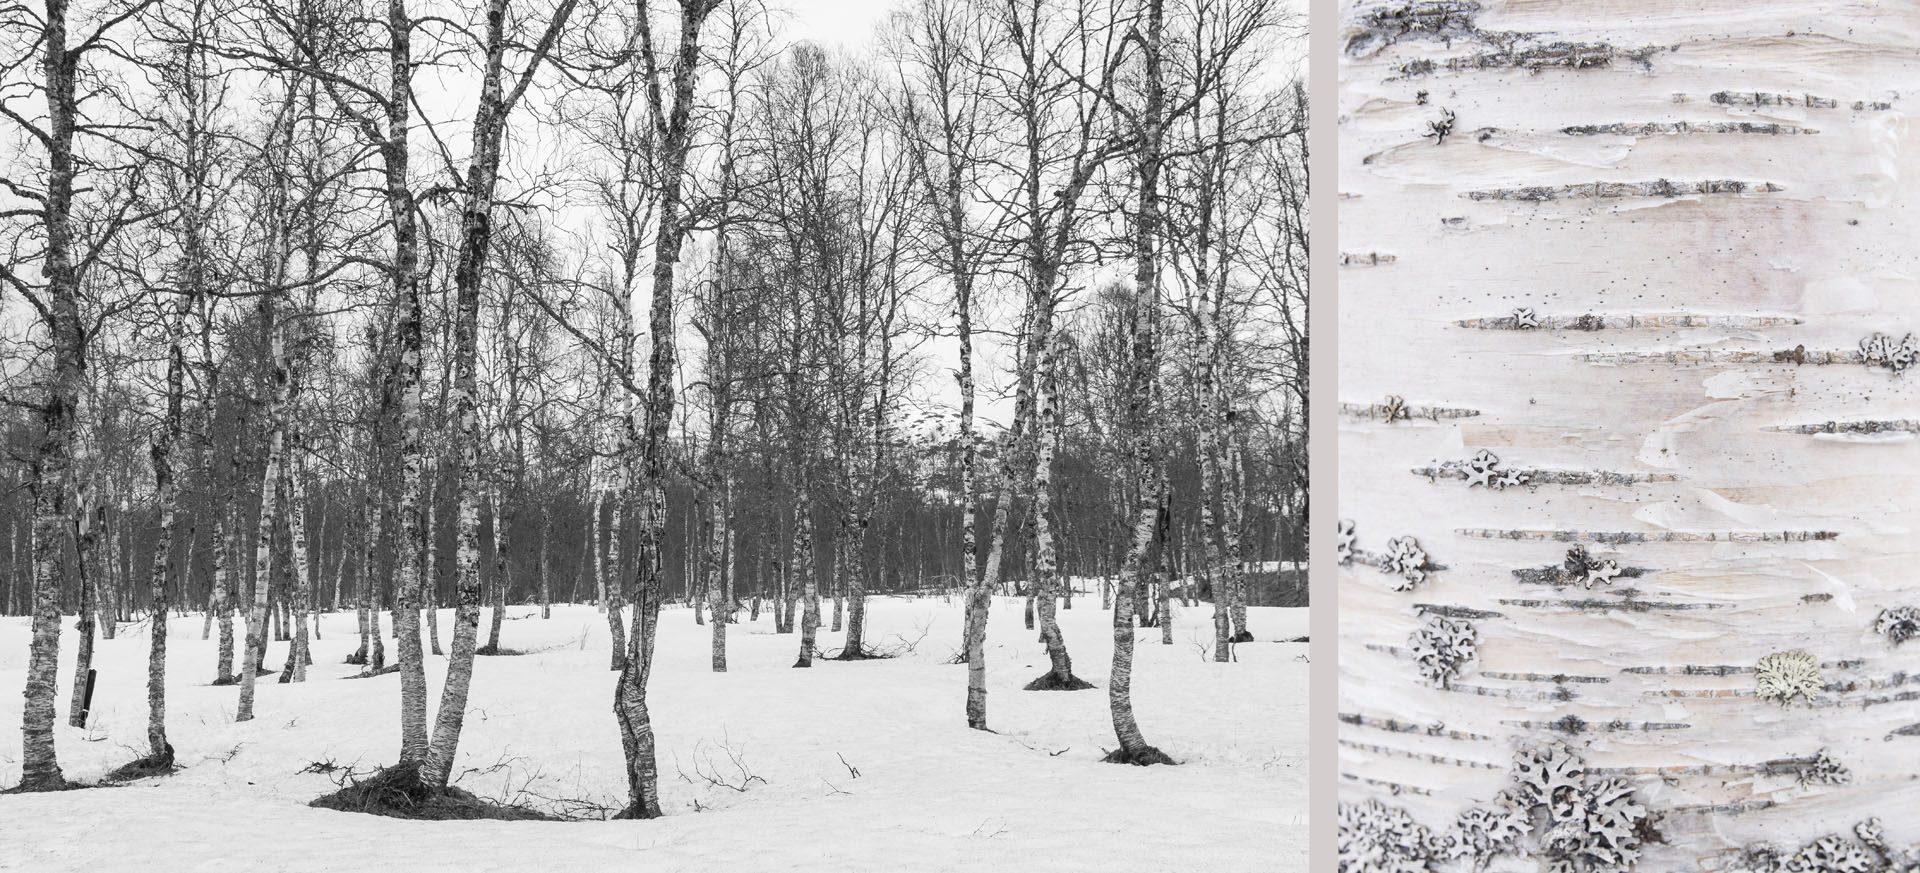 WaldRindenDoppel Birken IV • Lambda-Print auf KODAK Pro Endura, Alu-Dibond®, 110 x 50 cm, gerahmt als Art-Box • Auflage: 5 + 2 Artist's Proof